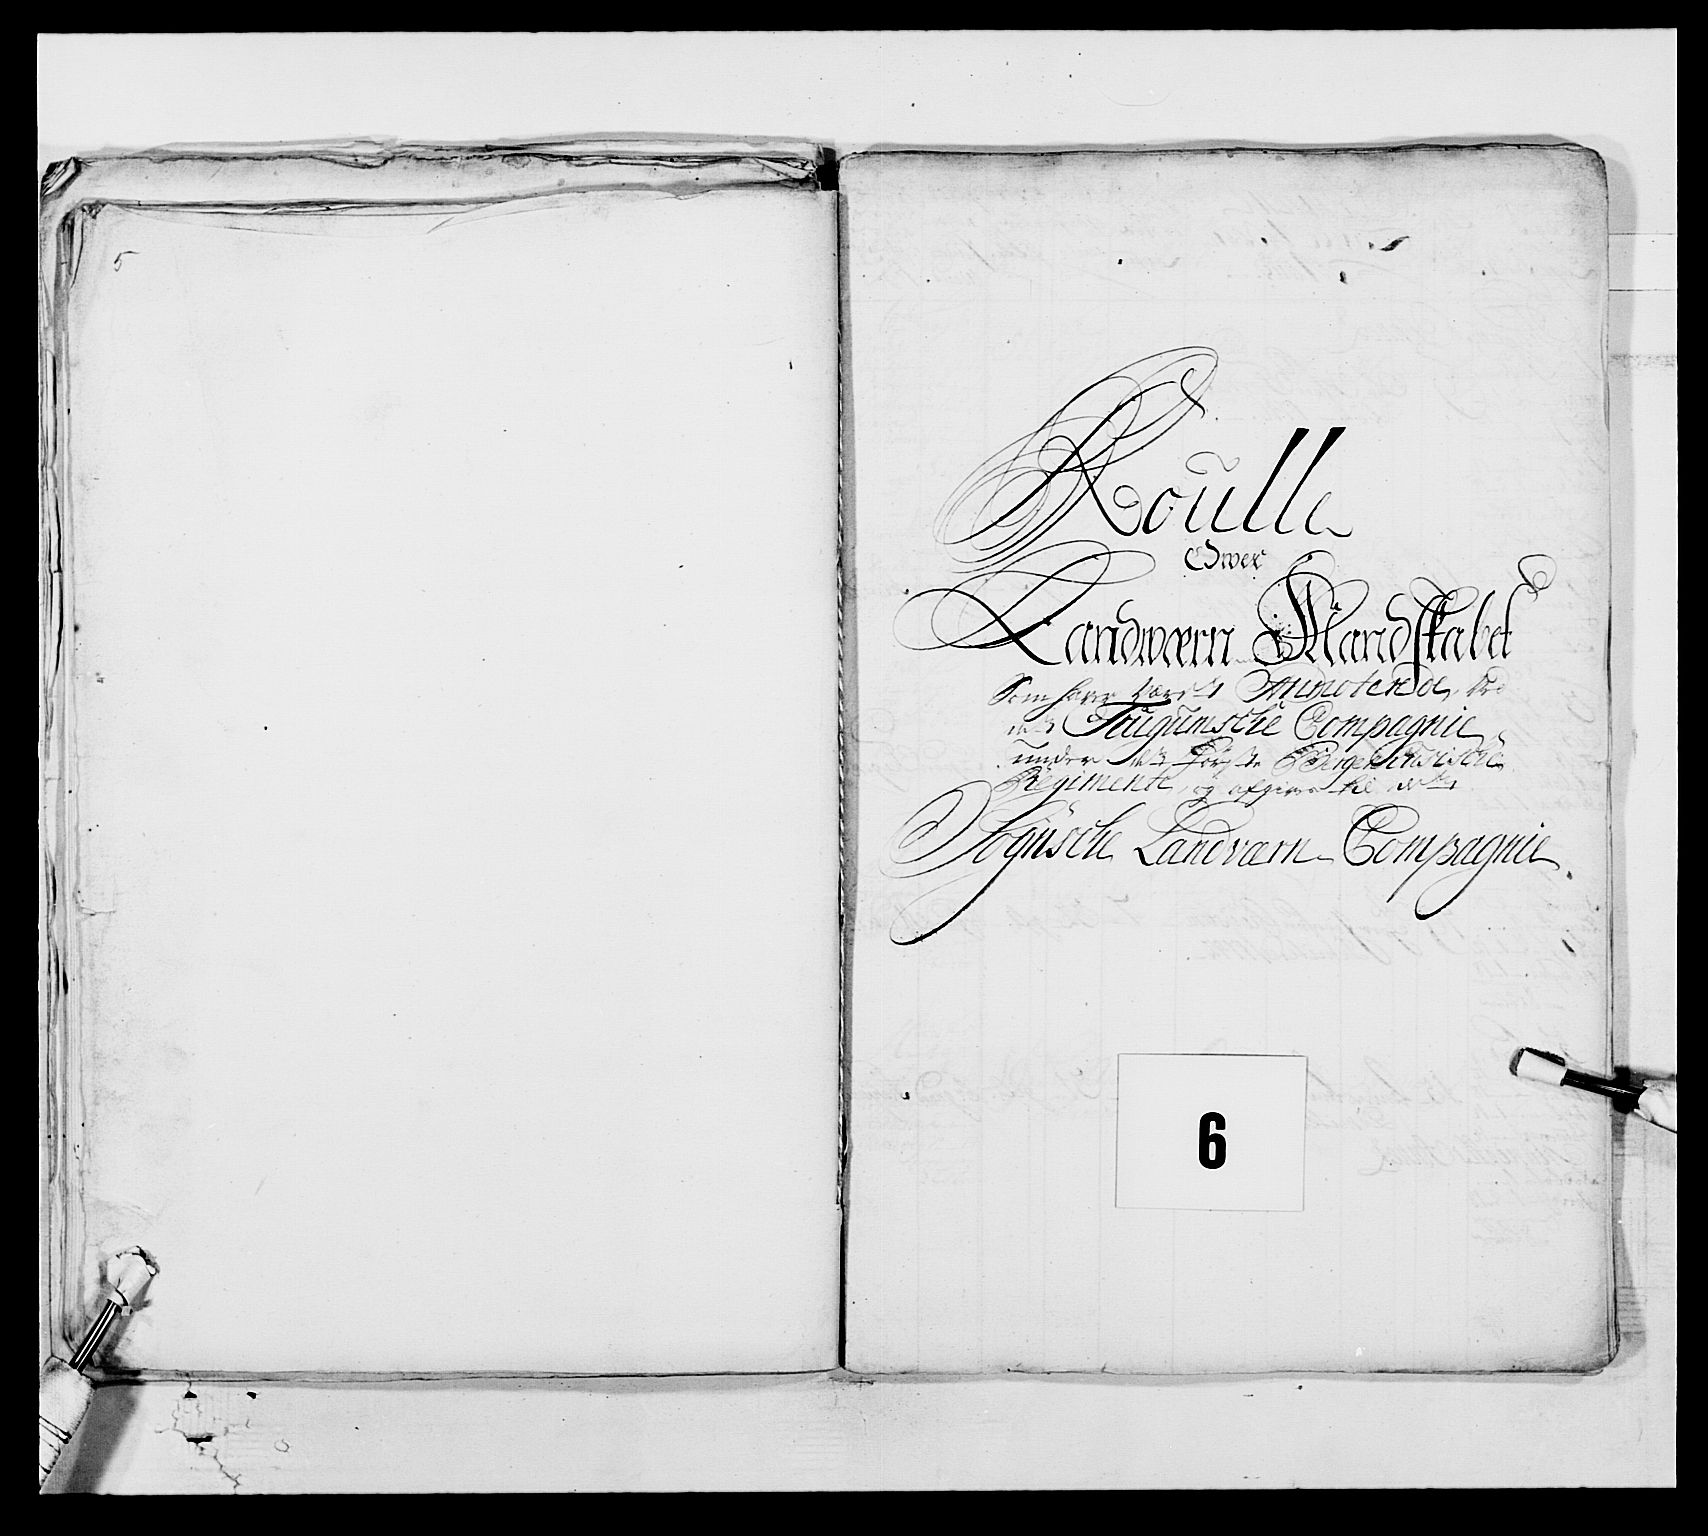 RA, Kommanderende general (KG I) med Det norske krigsdirektorium, E/Ea/L0517: 1. Bergenhusiske regiment, 1742-1756, s. 40